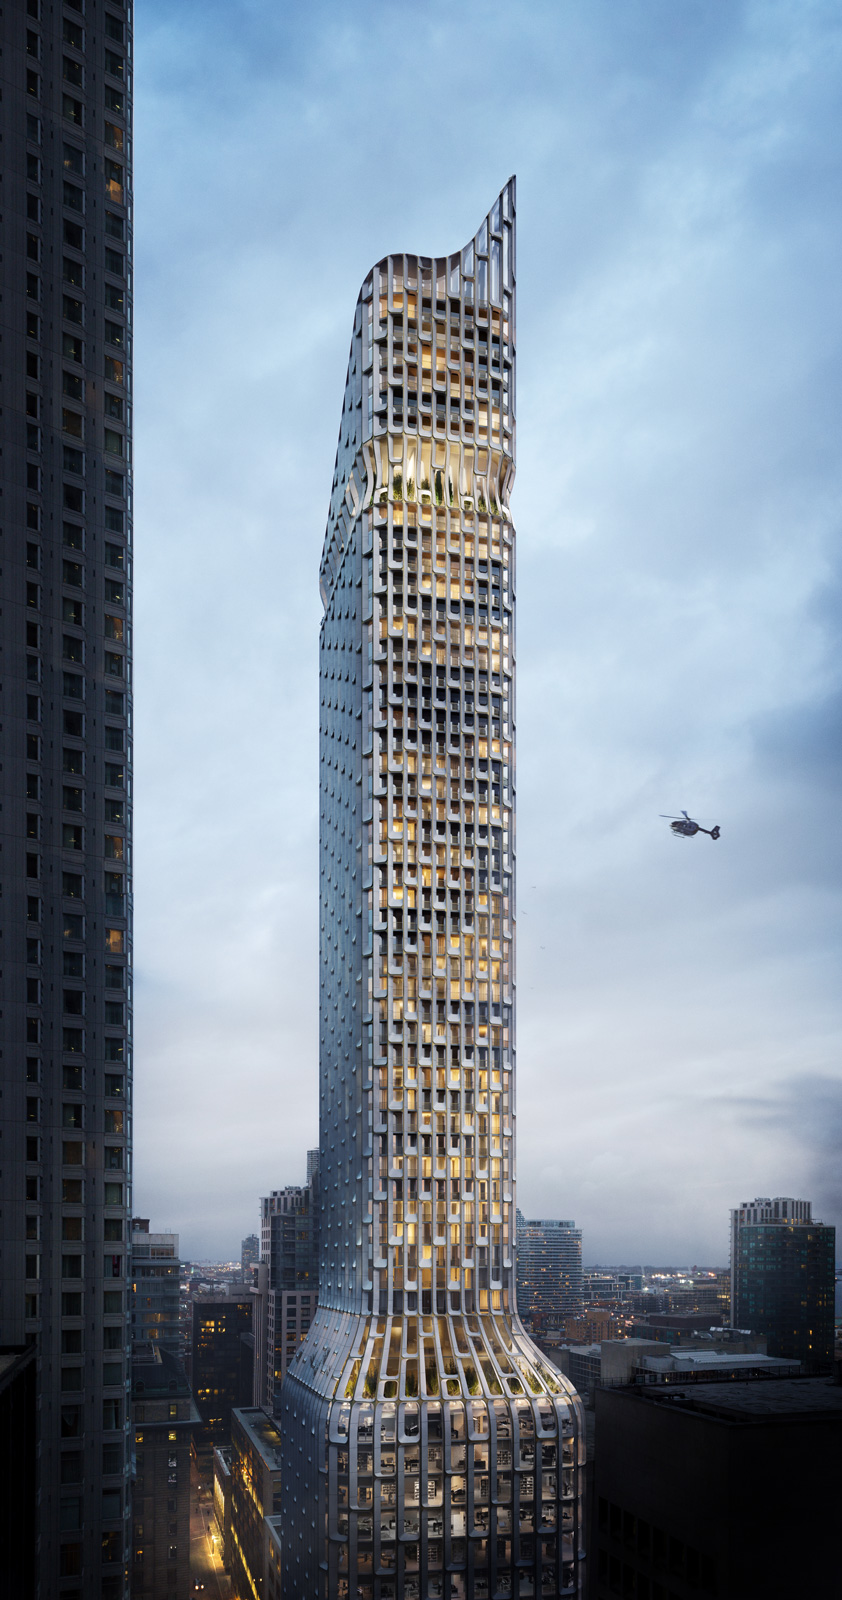 Yonge Street tower